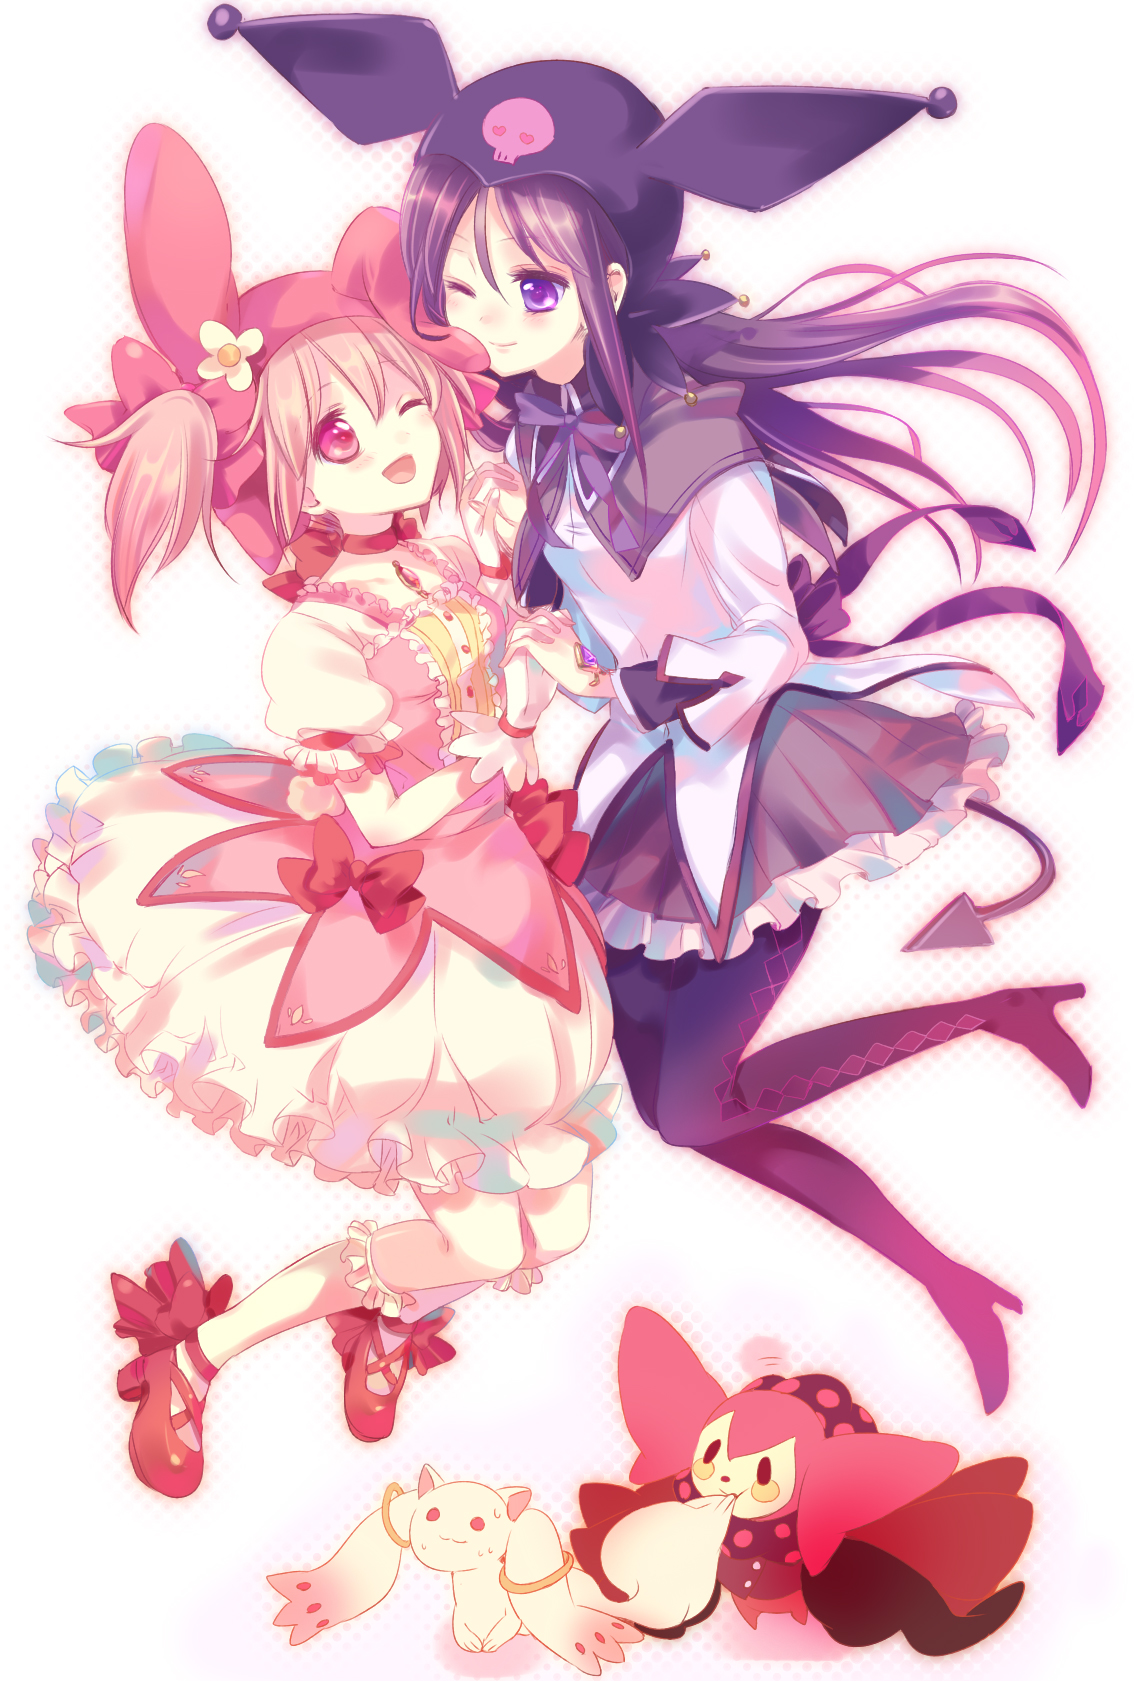 My Melody And Kuromi Anime 1134x1681 Wallpaper Teahub Io